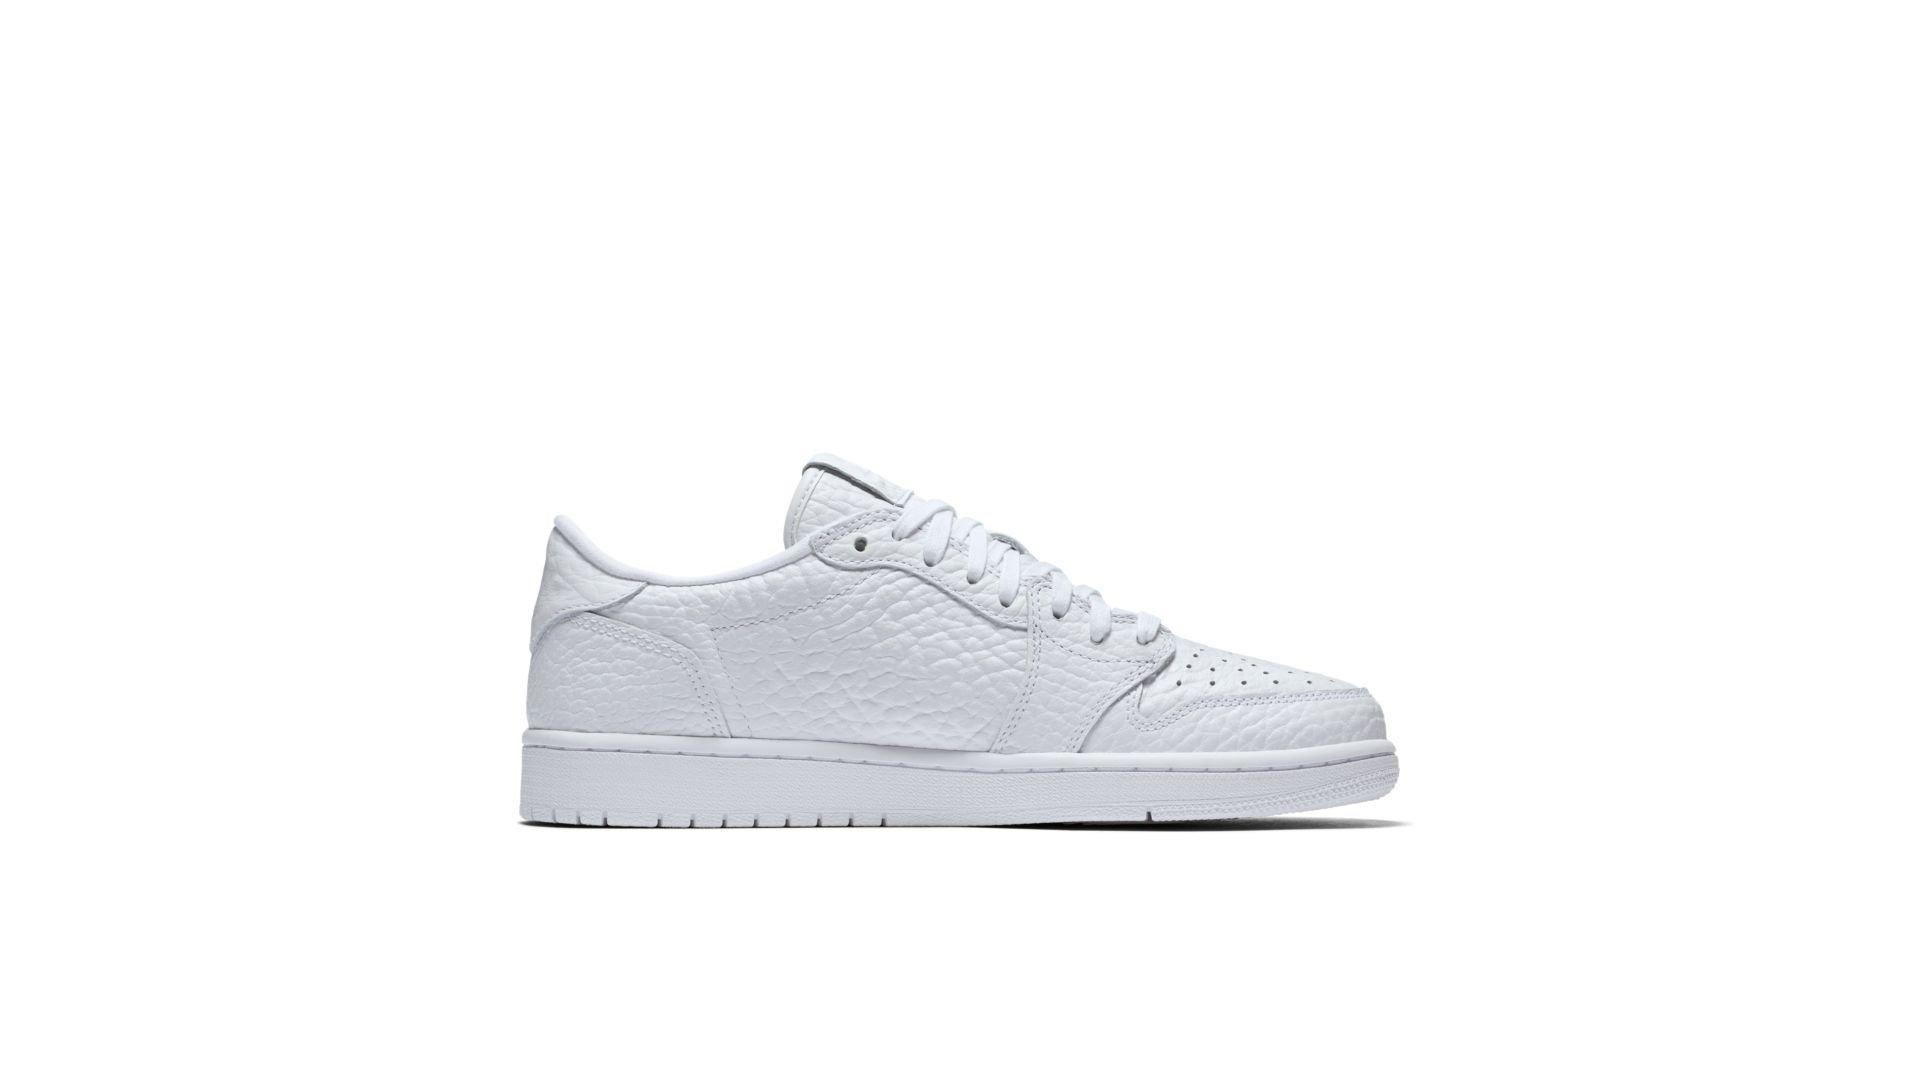 Jordan 1 Retro Low Swooshless White (872782-100)